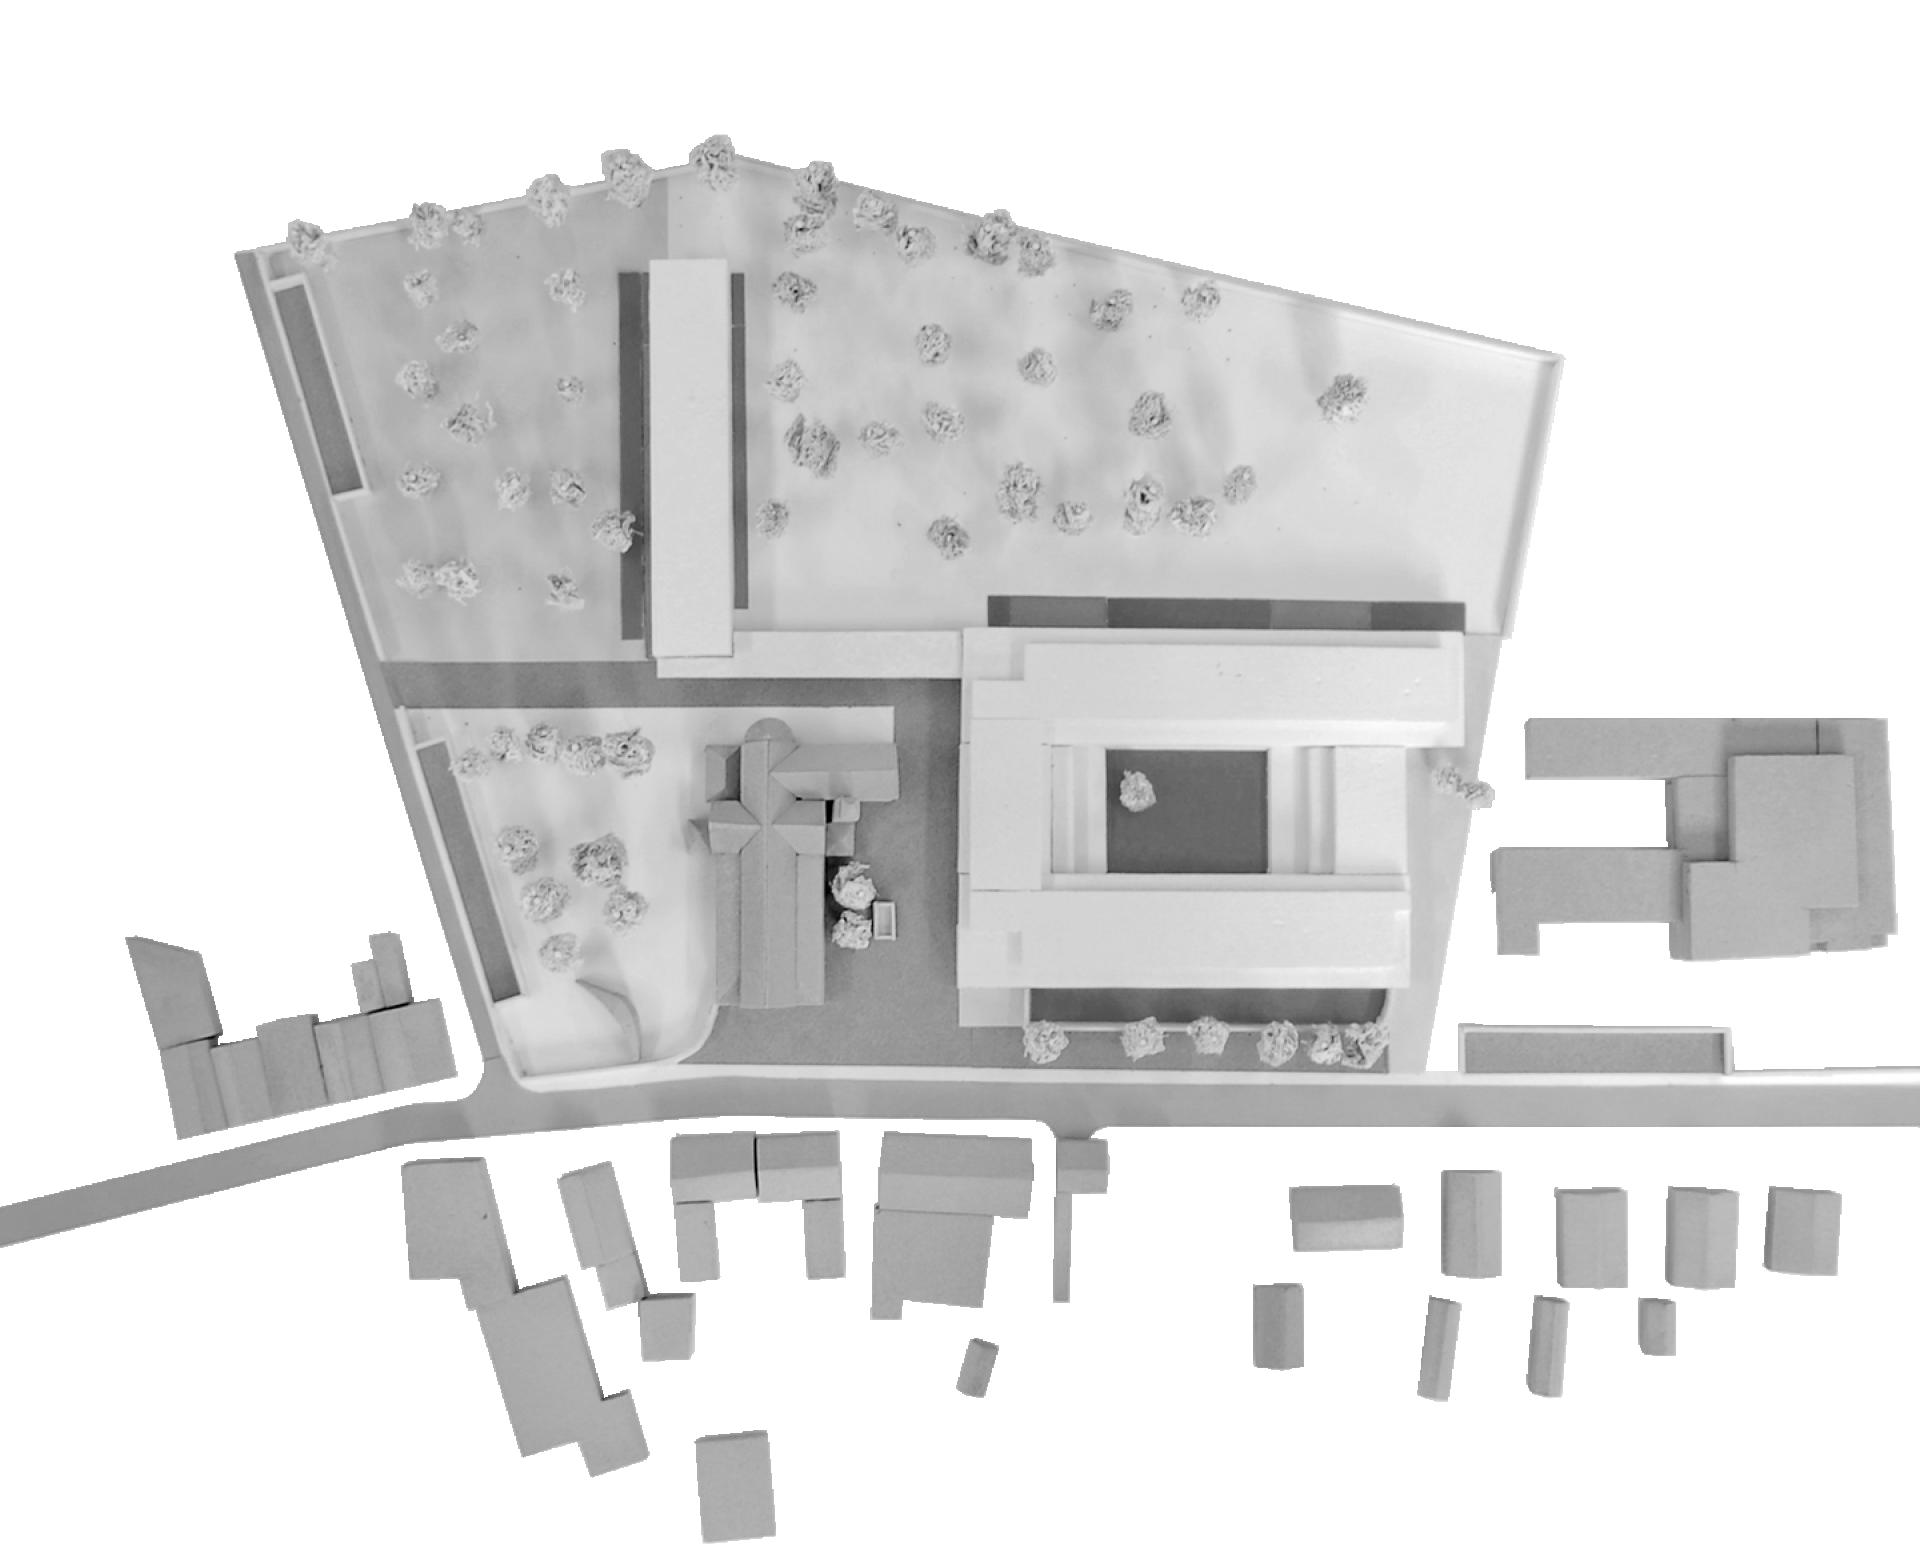 Kruishoutem Model Aerial Bn